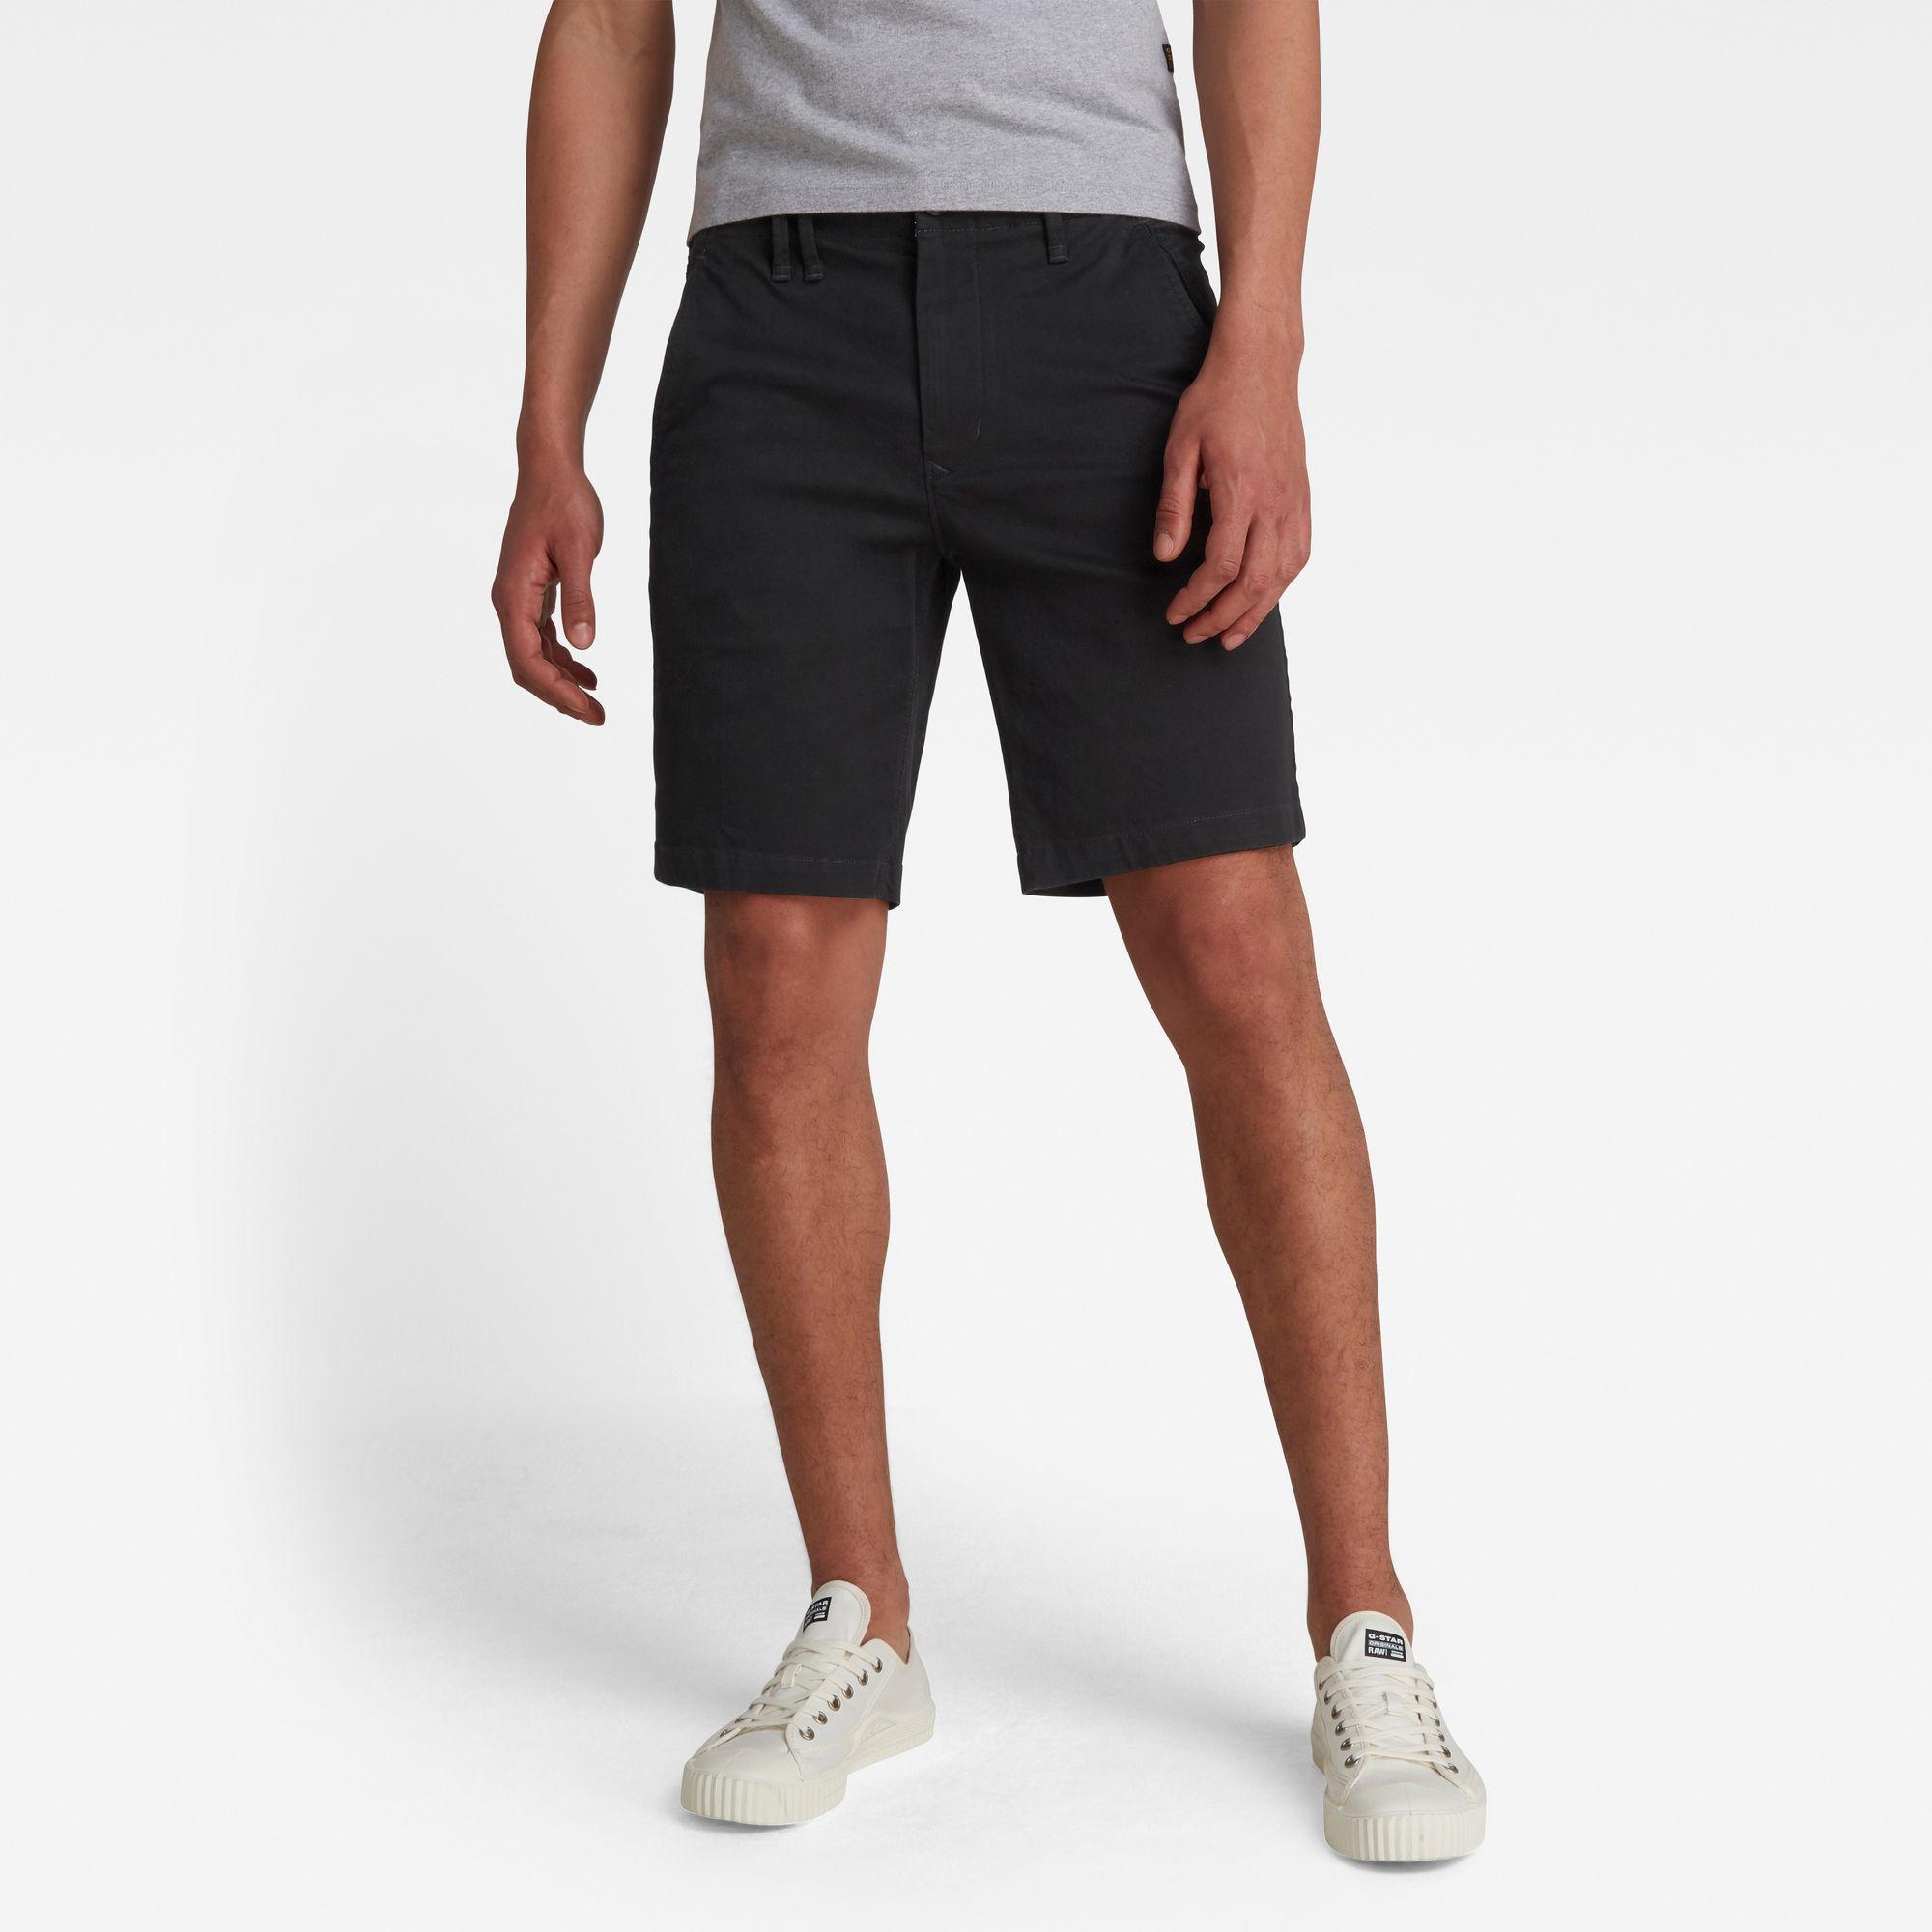 G-Star RAW Heren Vetar Shorts Zwart